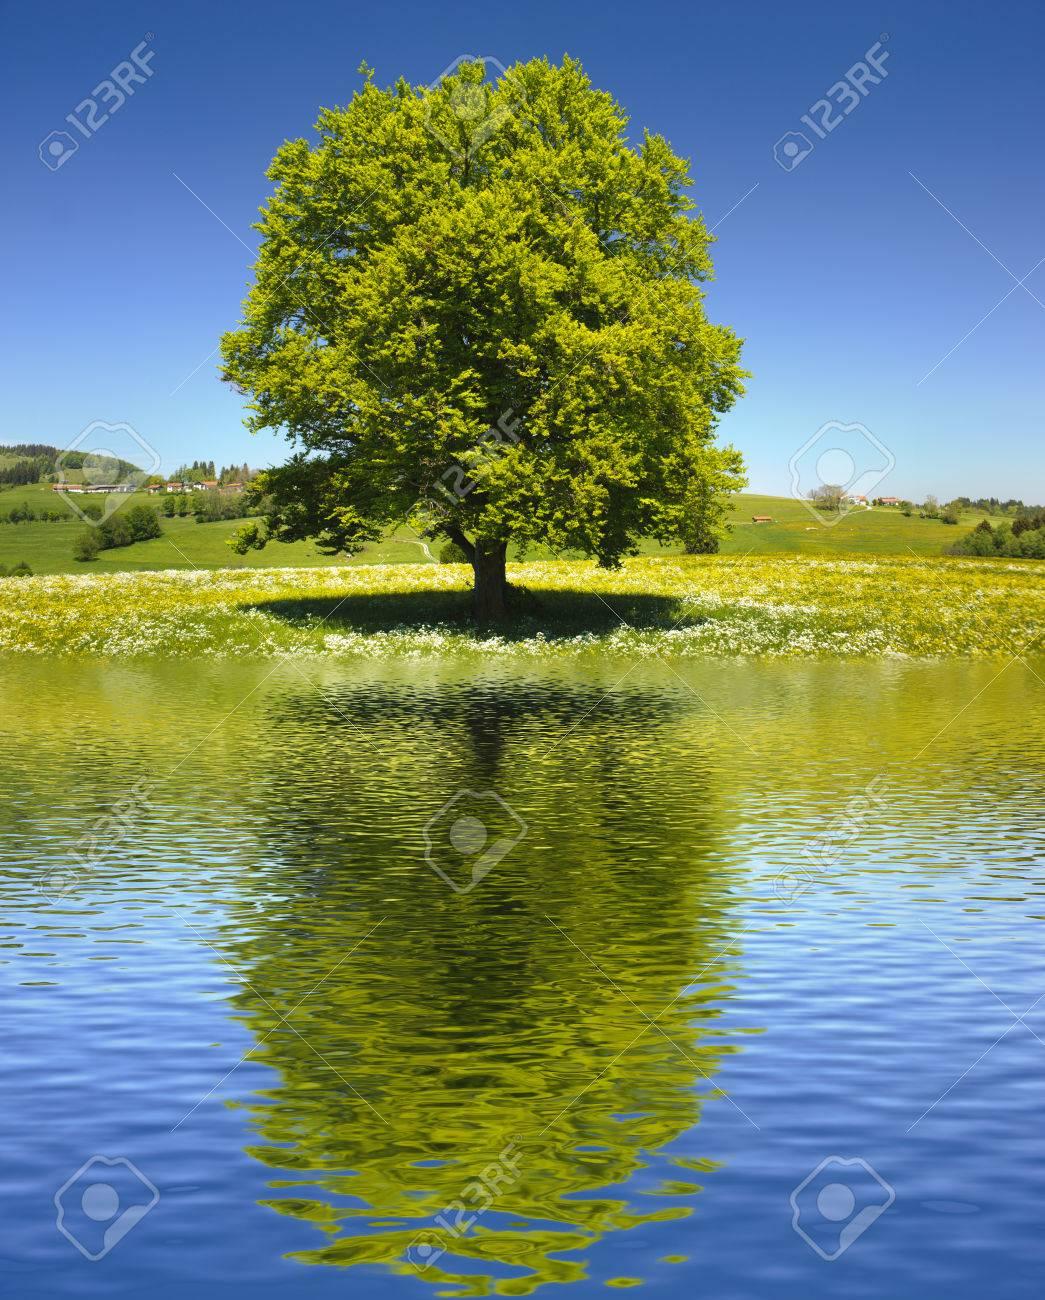 single big old tree mirroring on water surface - 60721050